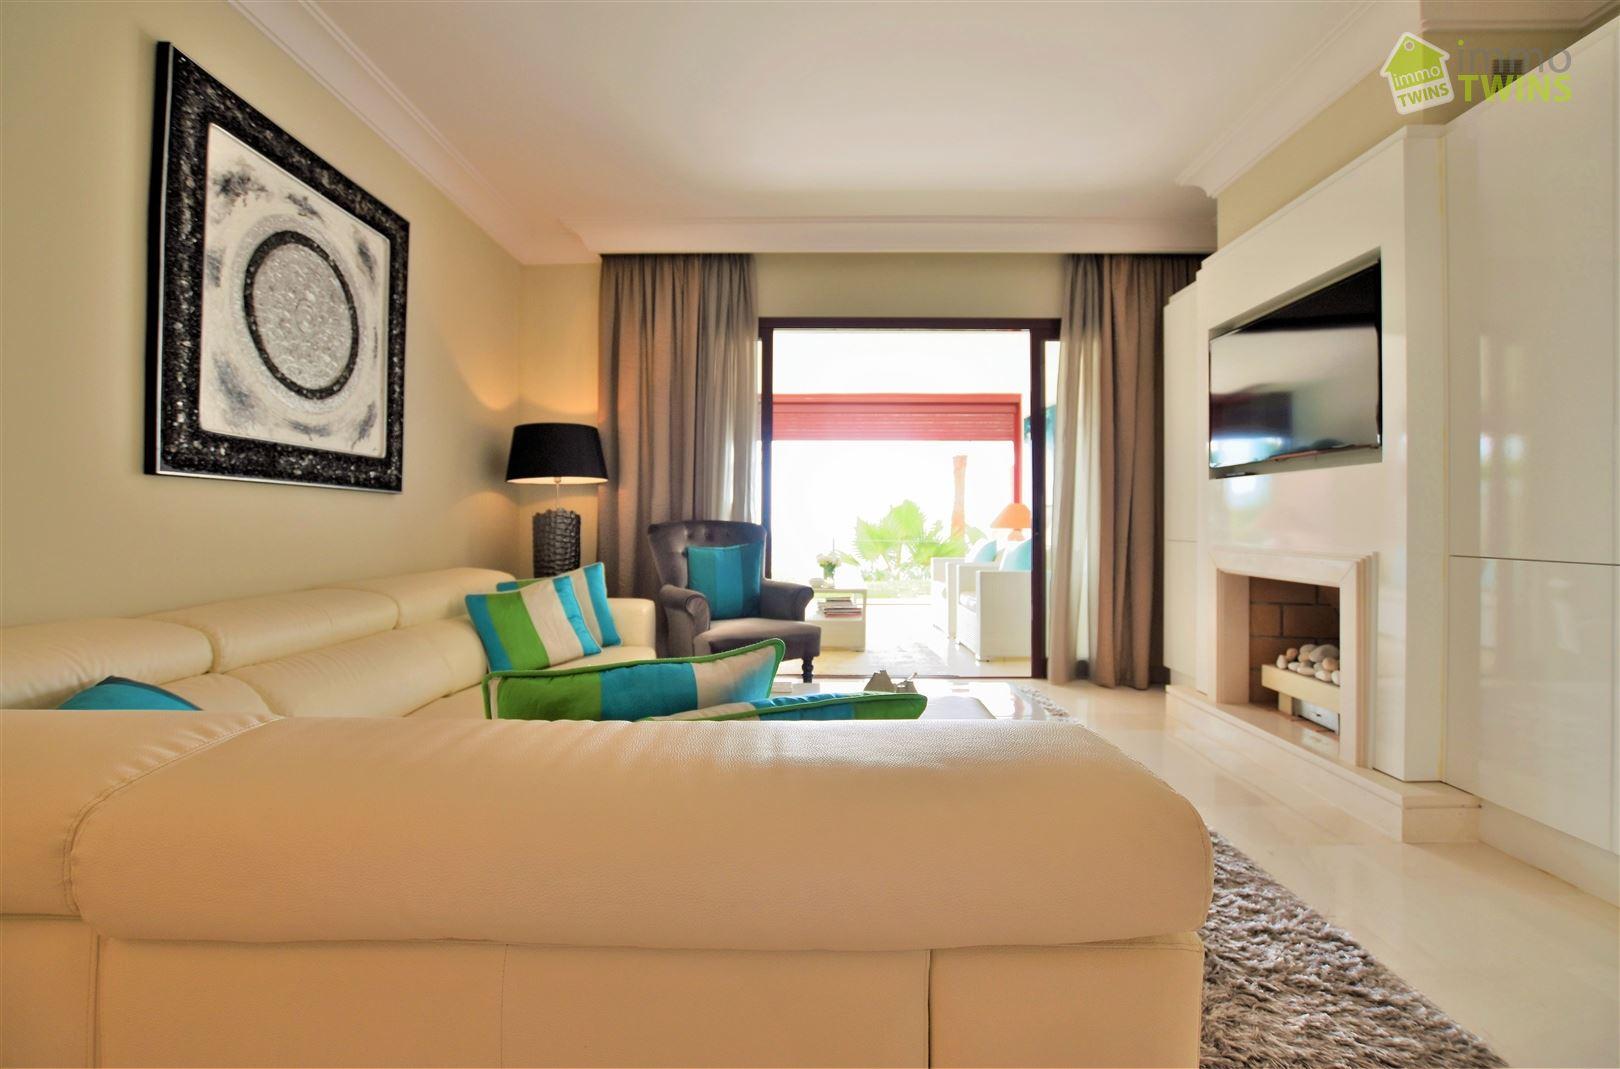 Foto 6 : Appartement te 29679 MARBELLA (Spanje) - Prijs € 485.000